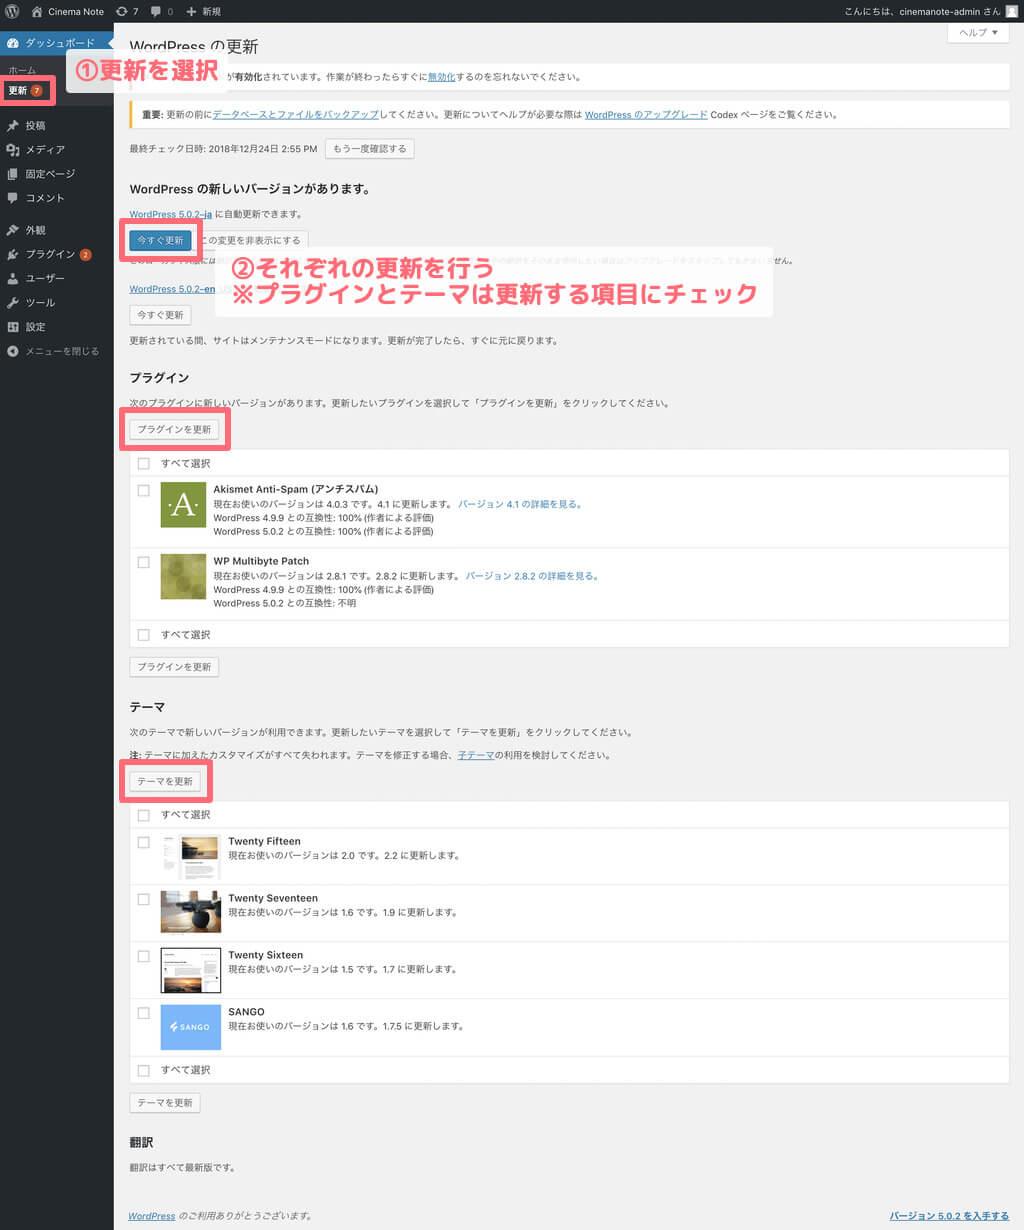 WordPressやプラグイン、テーマの更新を確認する